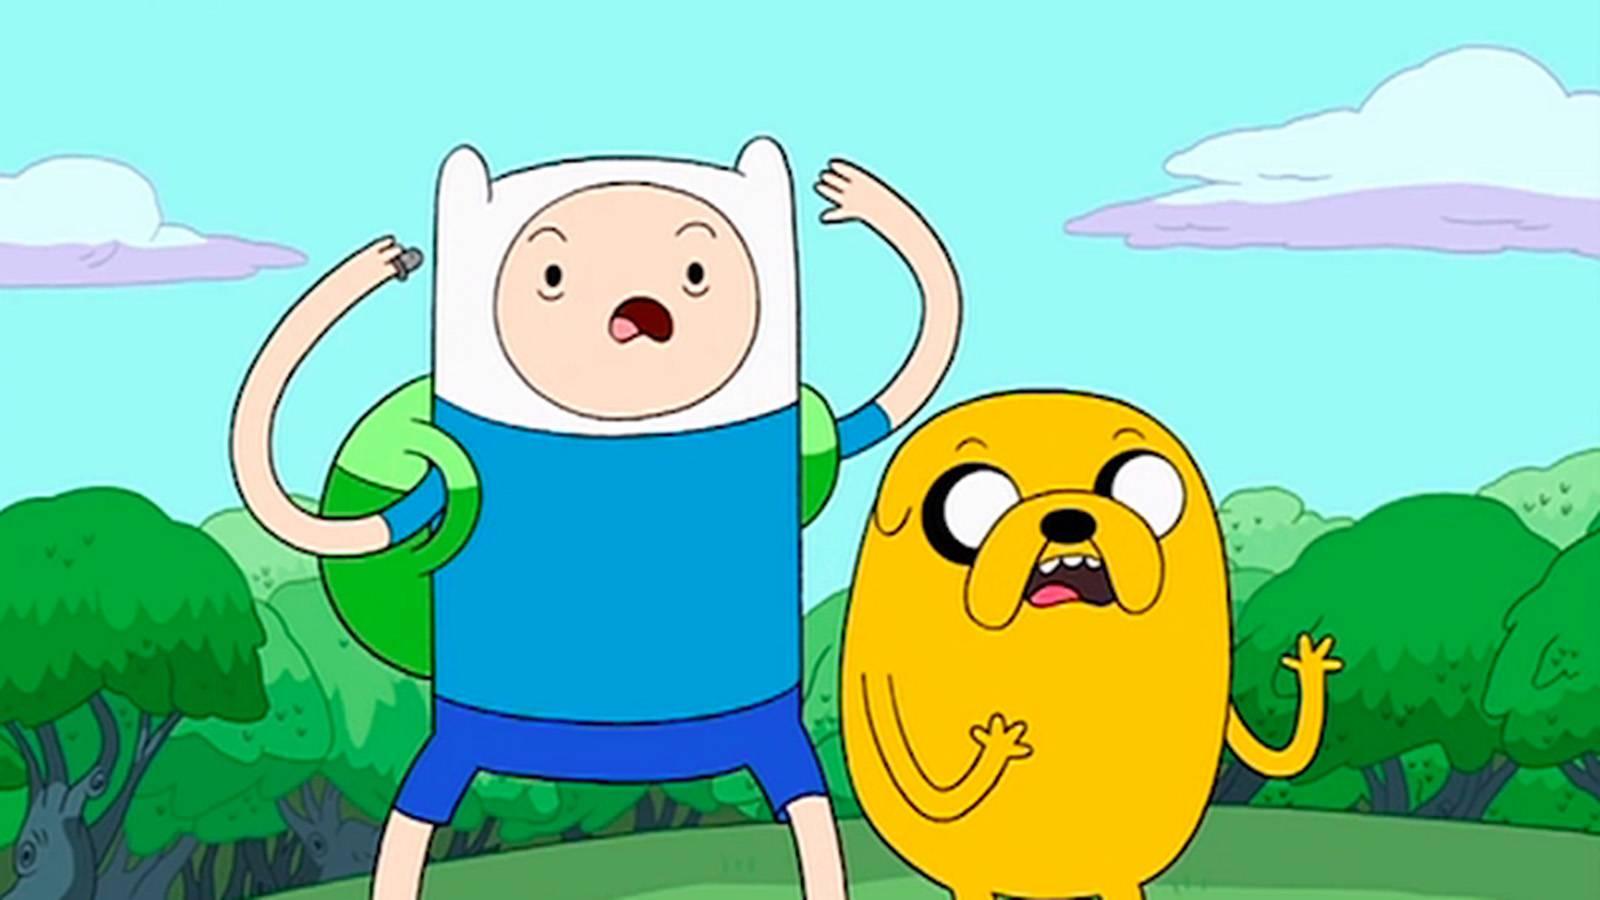 series animadas década - www.culturageek.com.ar